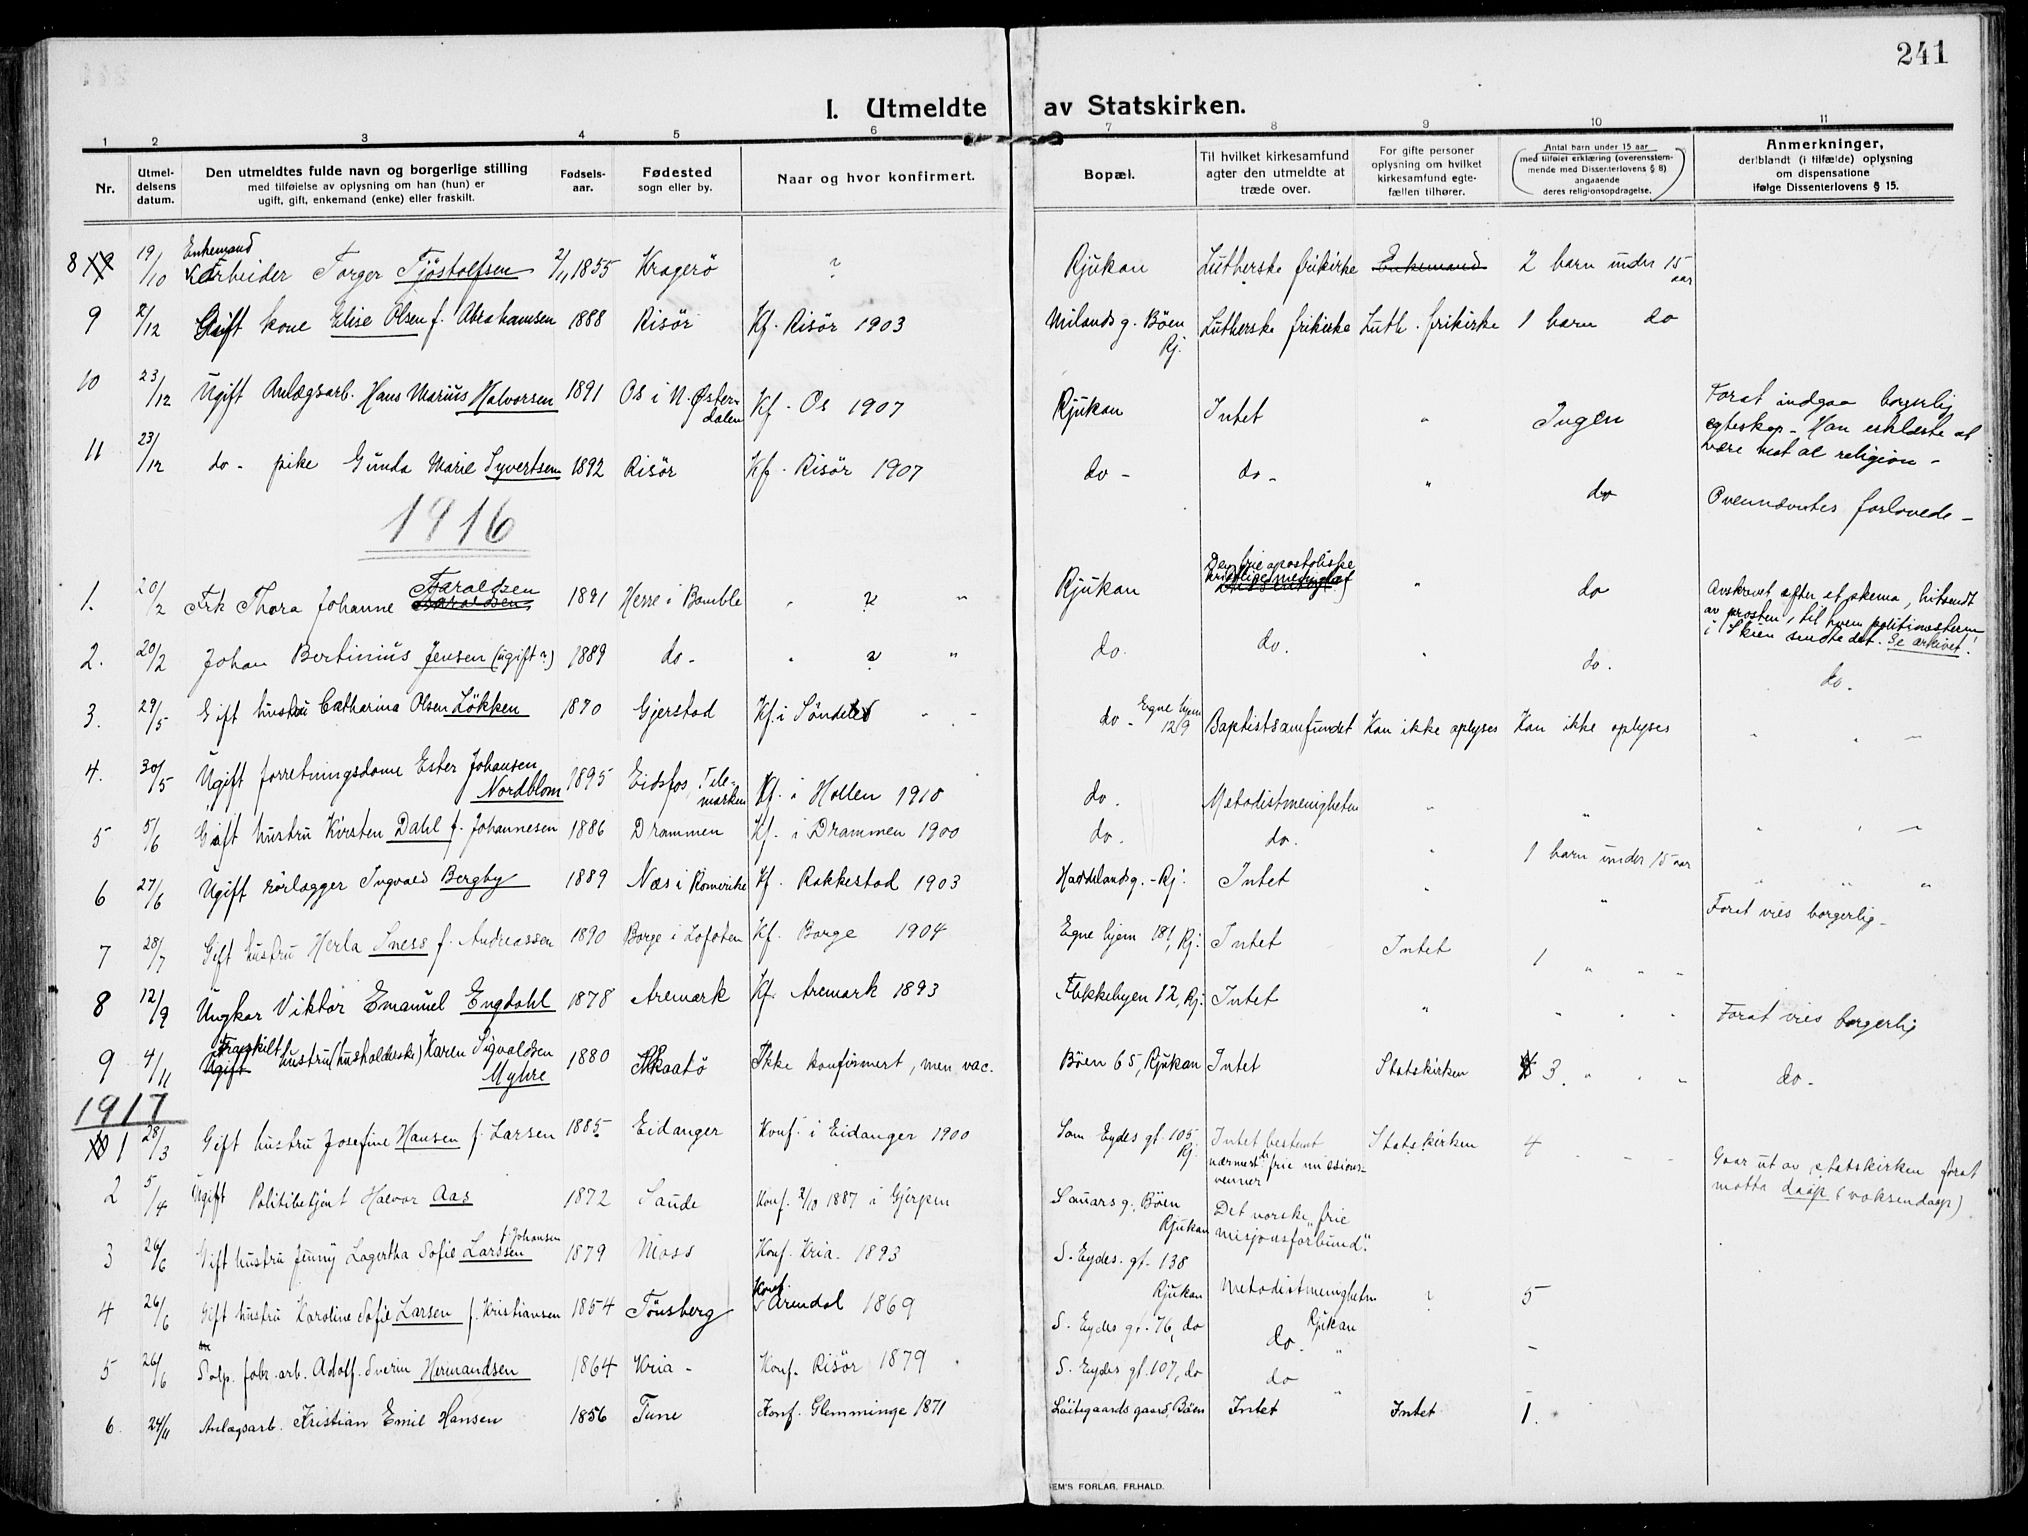 SAKO, Rjukan kirkebøker, F/Fa/L0002: Ministerialbok nr. 2, 1912-1917, s. 241